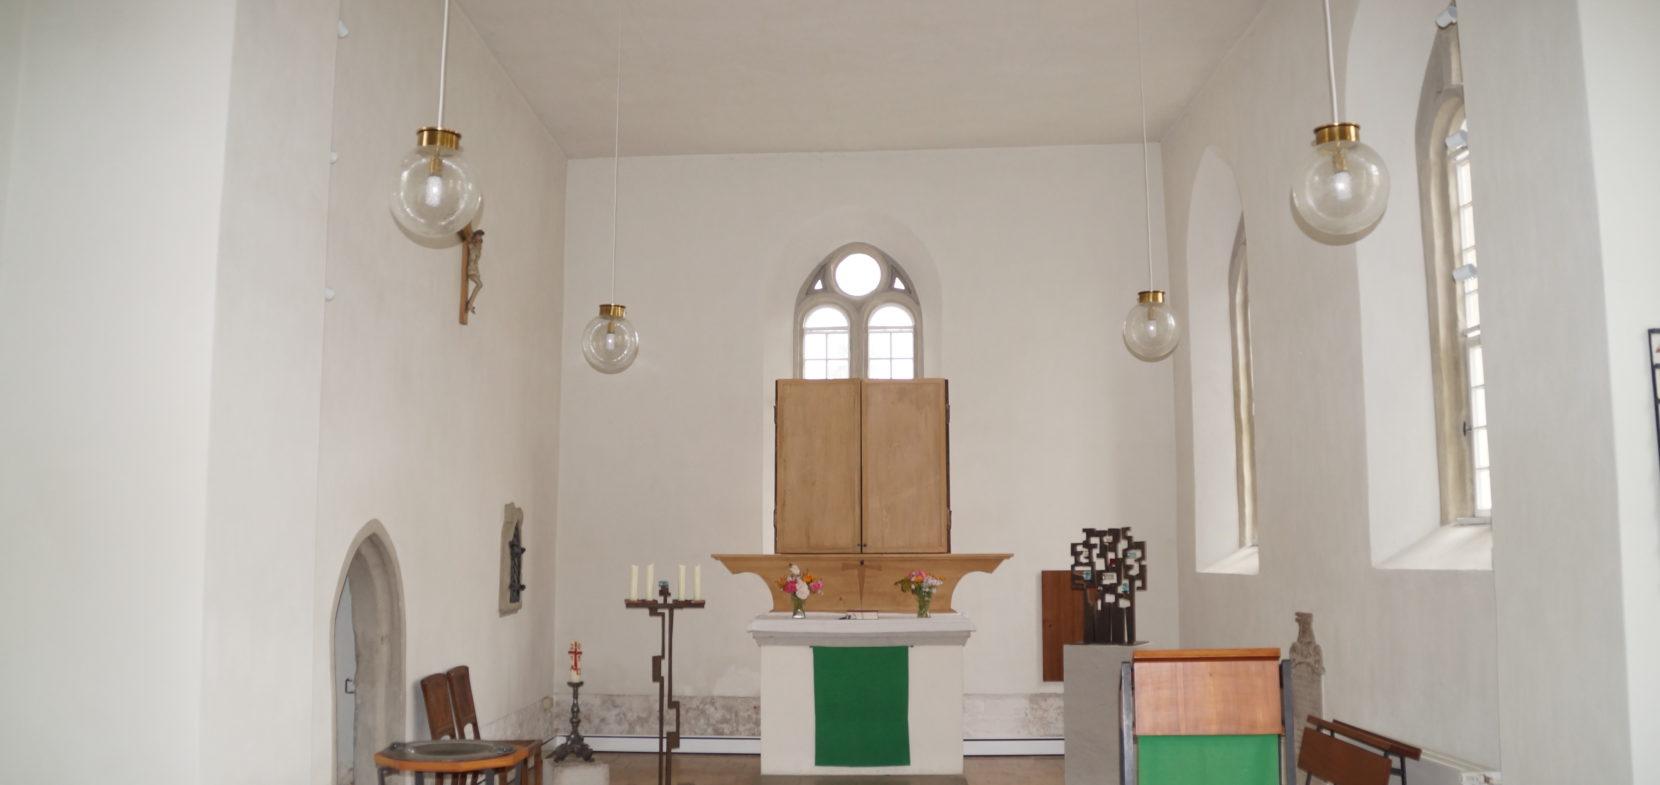 Innenansichten der Schloßkirche